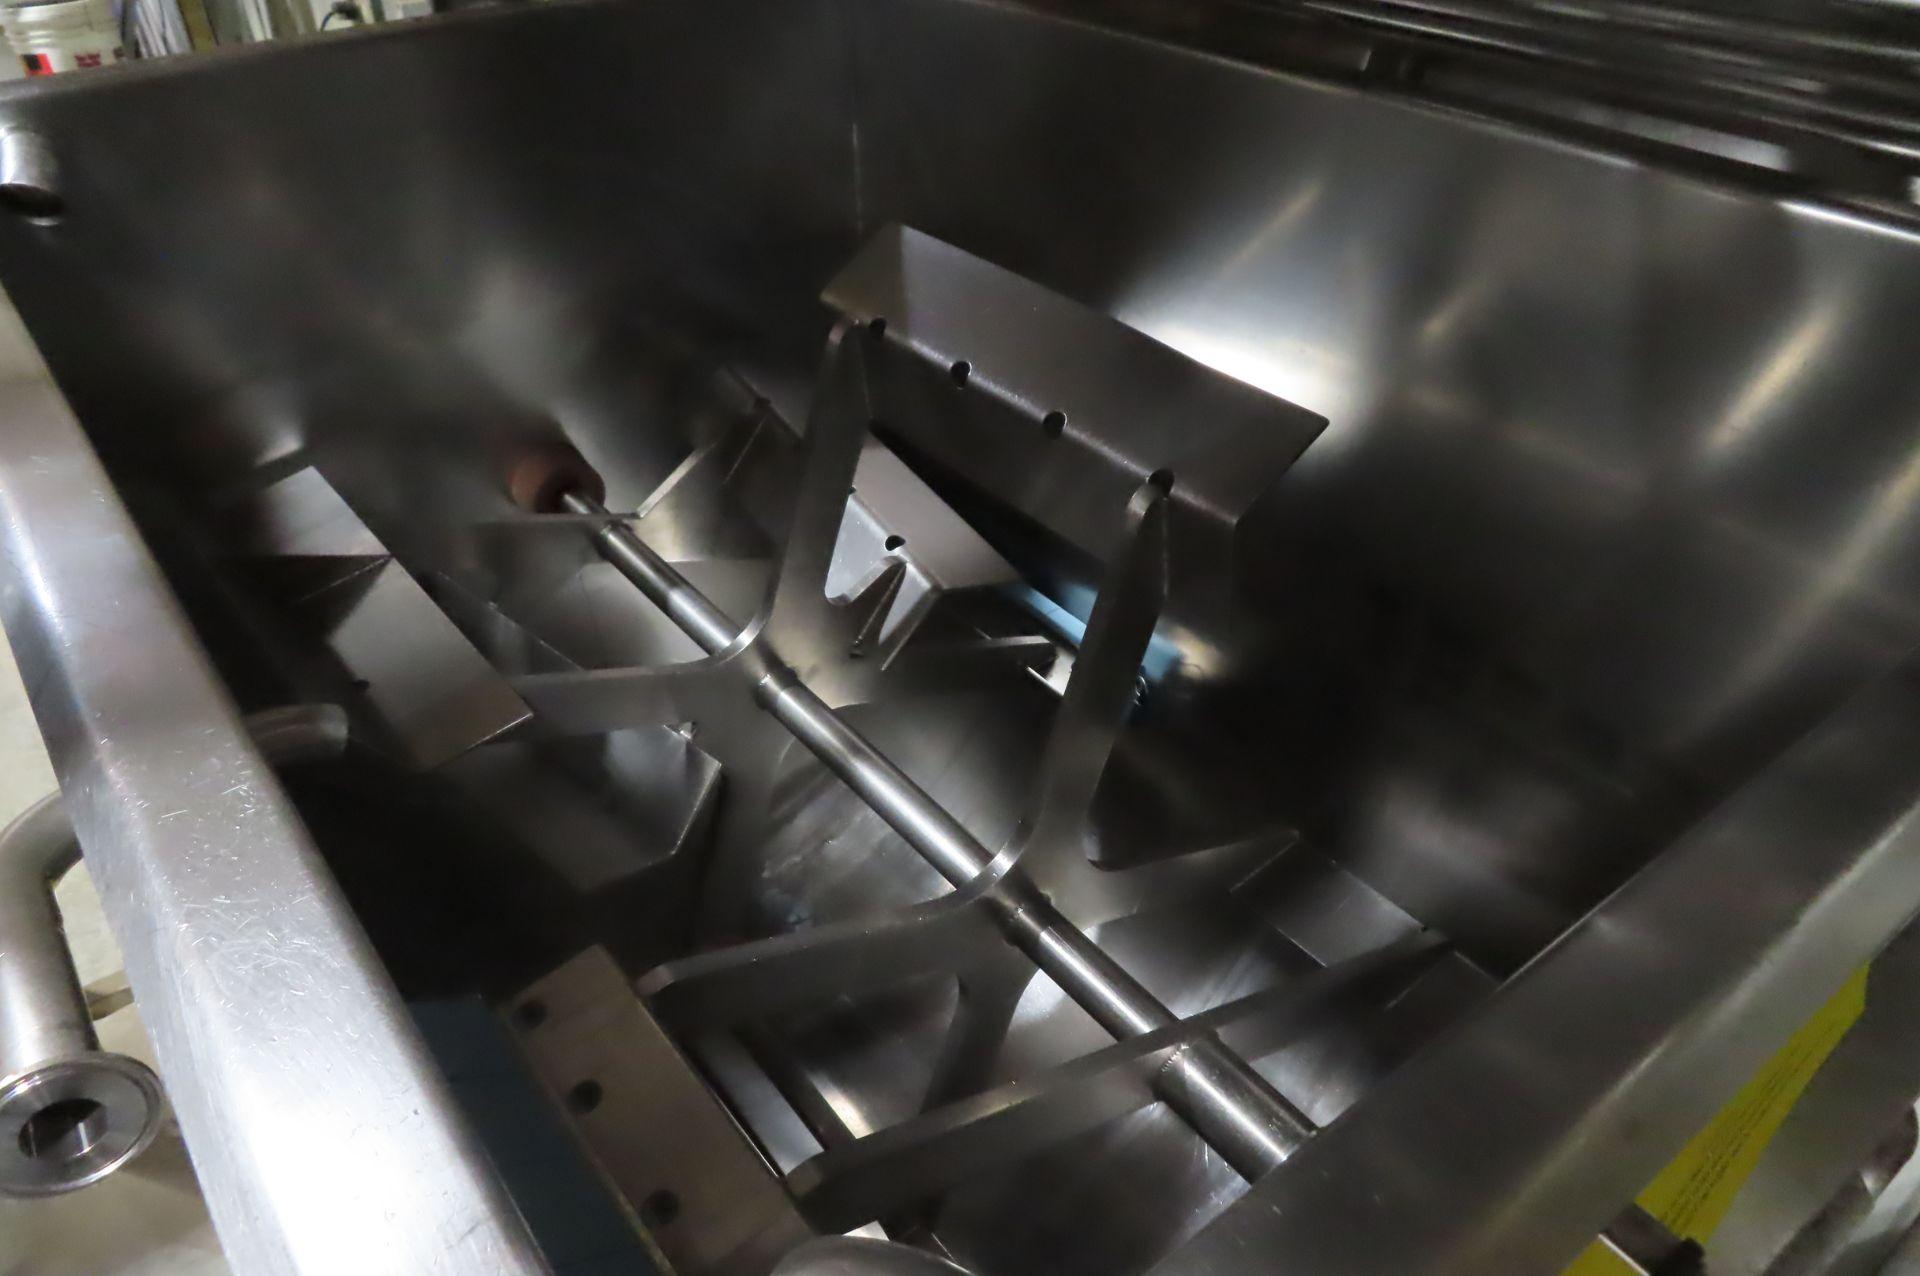 Paddle mixer - Image 2 of 4